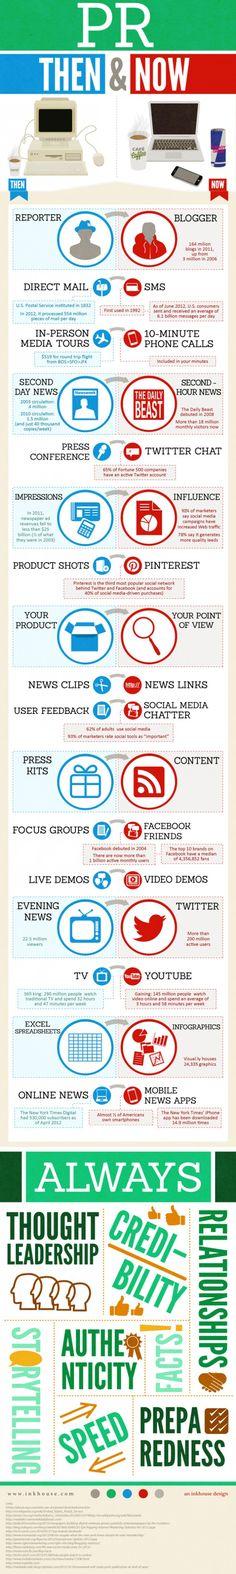 The evolution of PR!